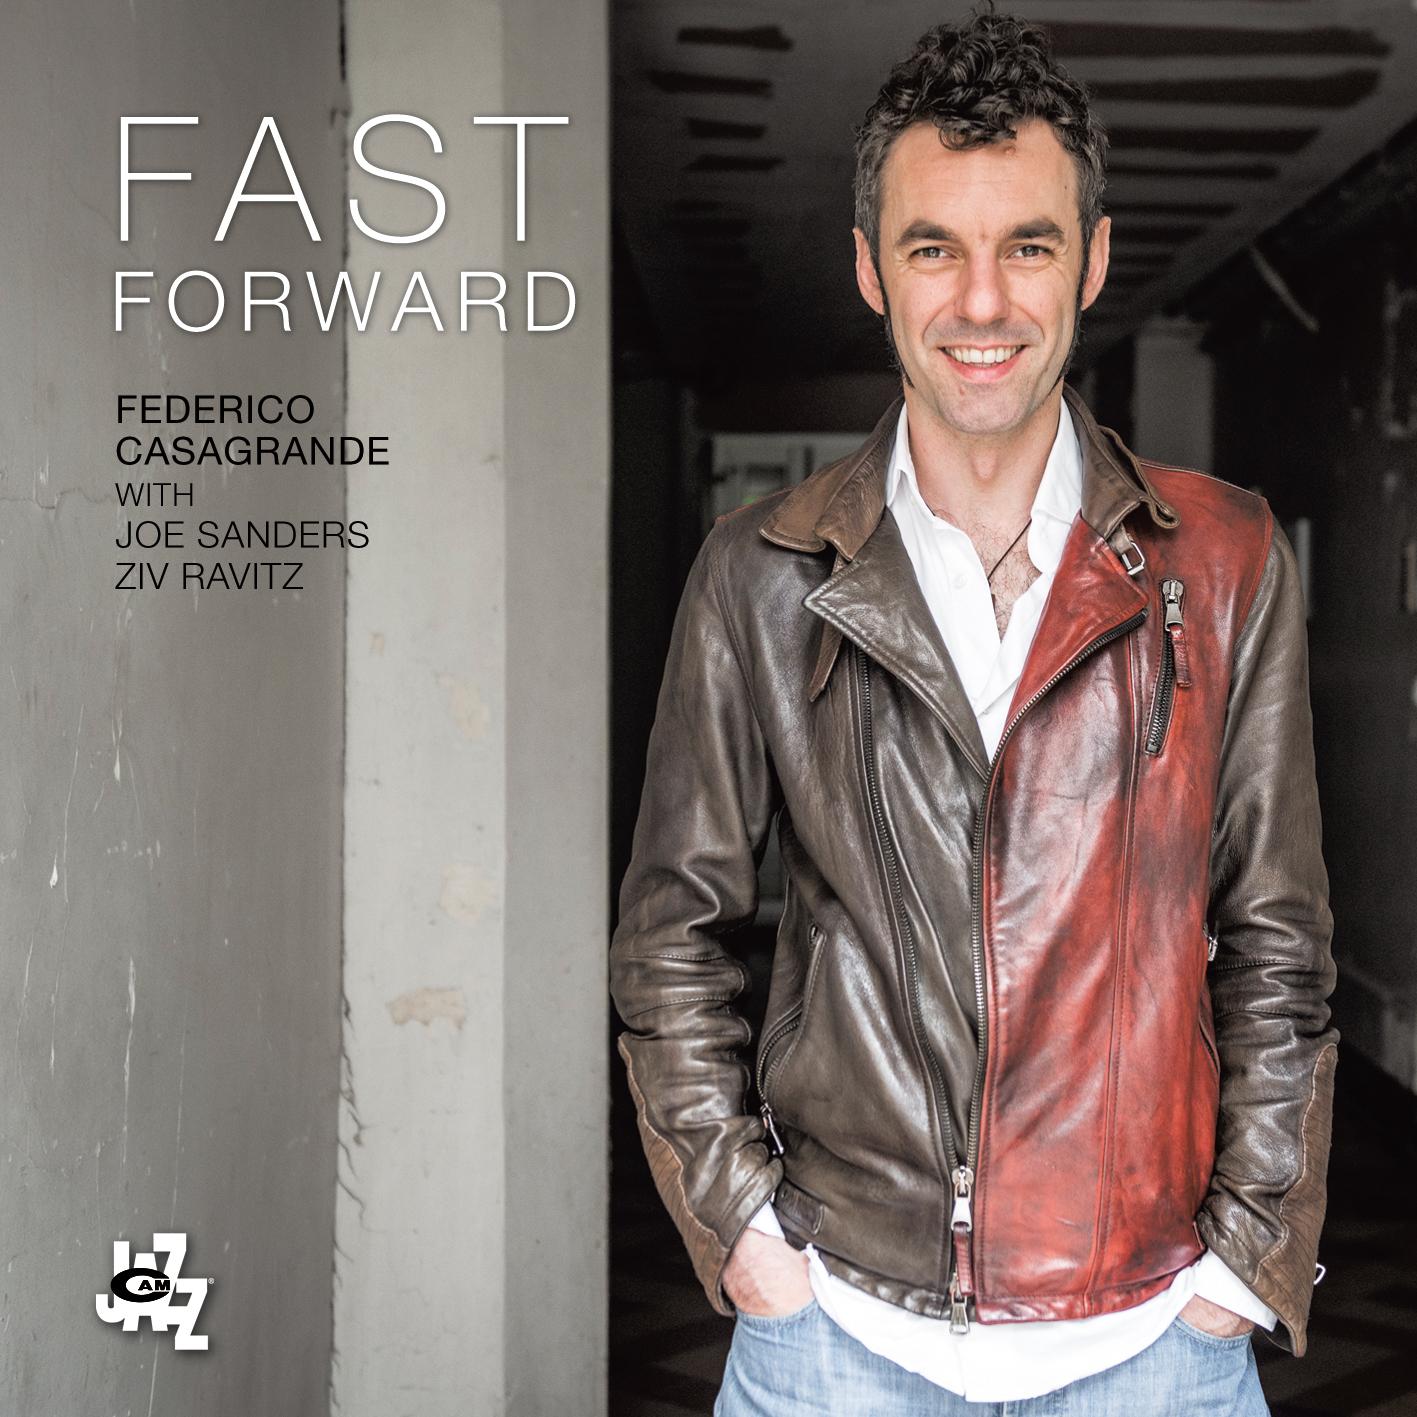 Federico Casagrande</br> Fast Forward</br> Cam Jazz, 2017